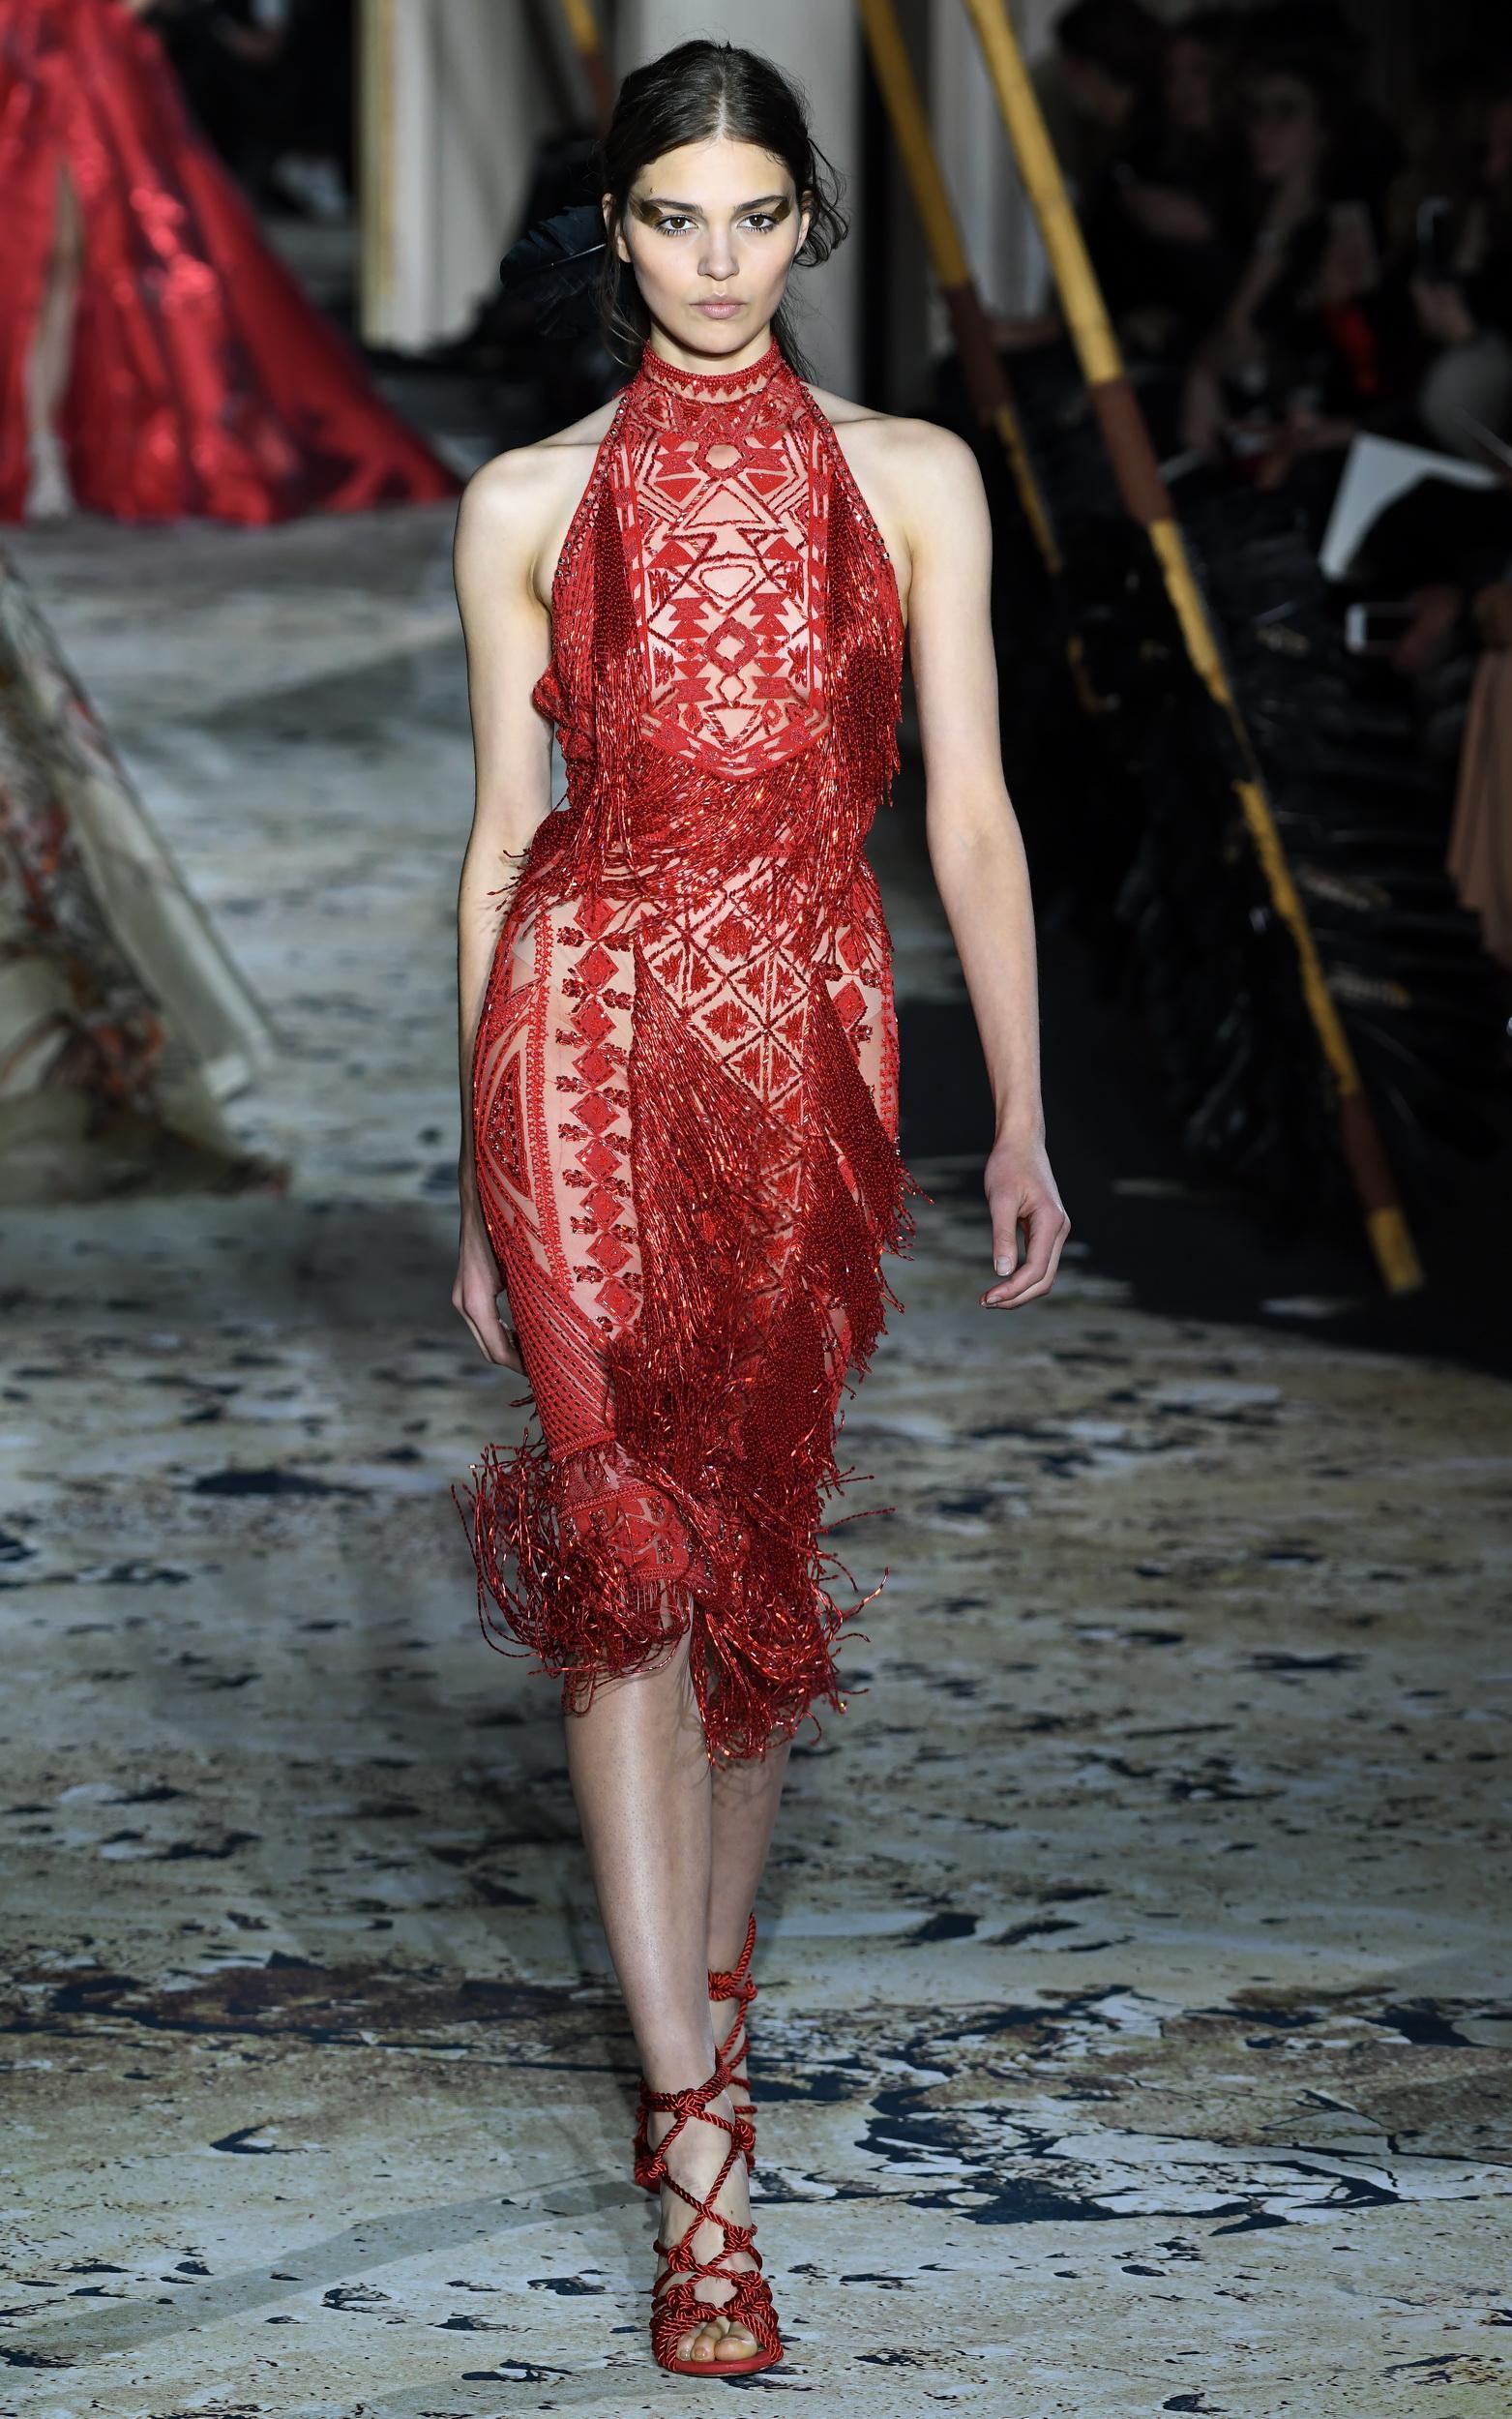 Paris Haute Couture SS 2018 Zuhair Murad 4to4u Arthur Koff 7.JPG